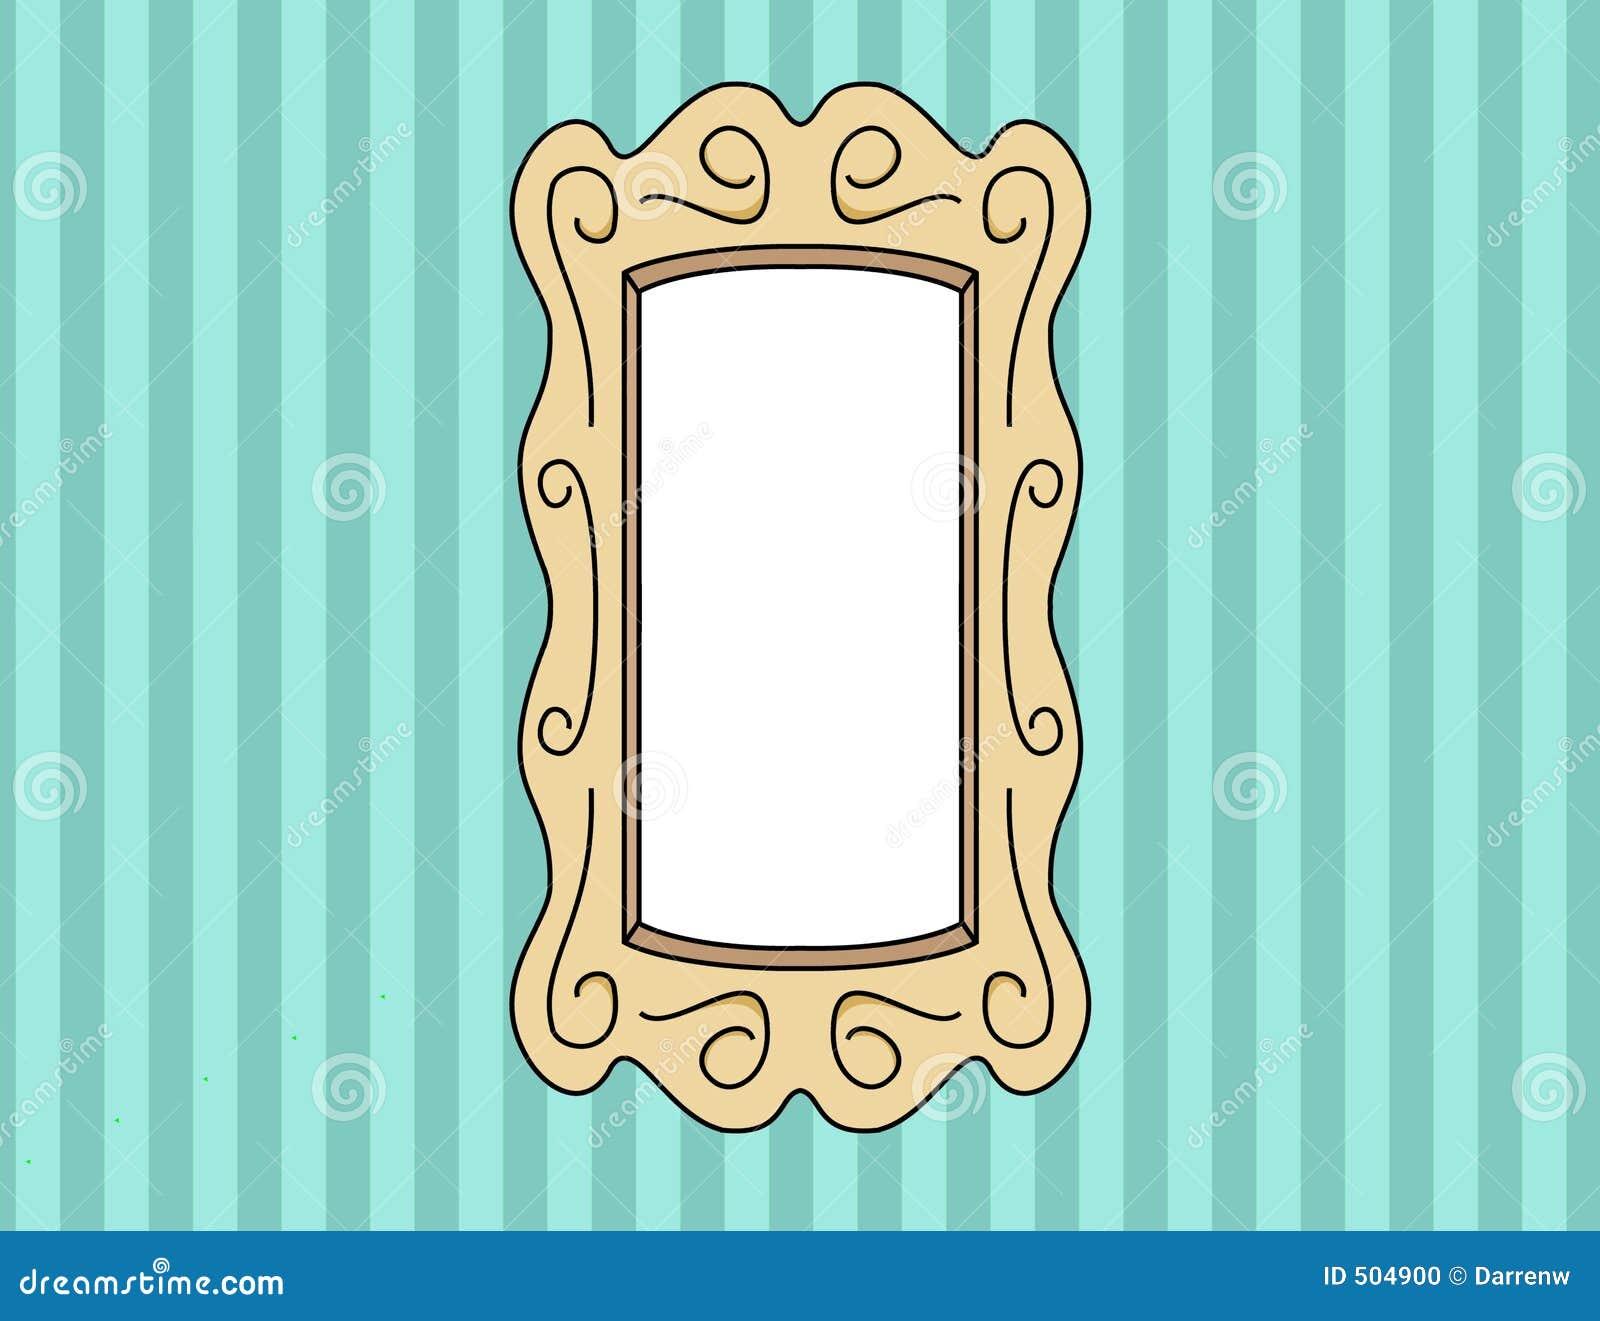 Toon Frame Stock Photo - Image: 504900